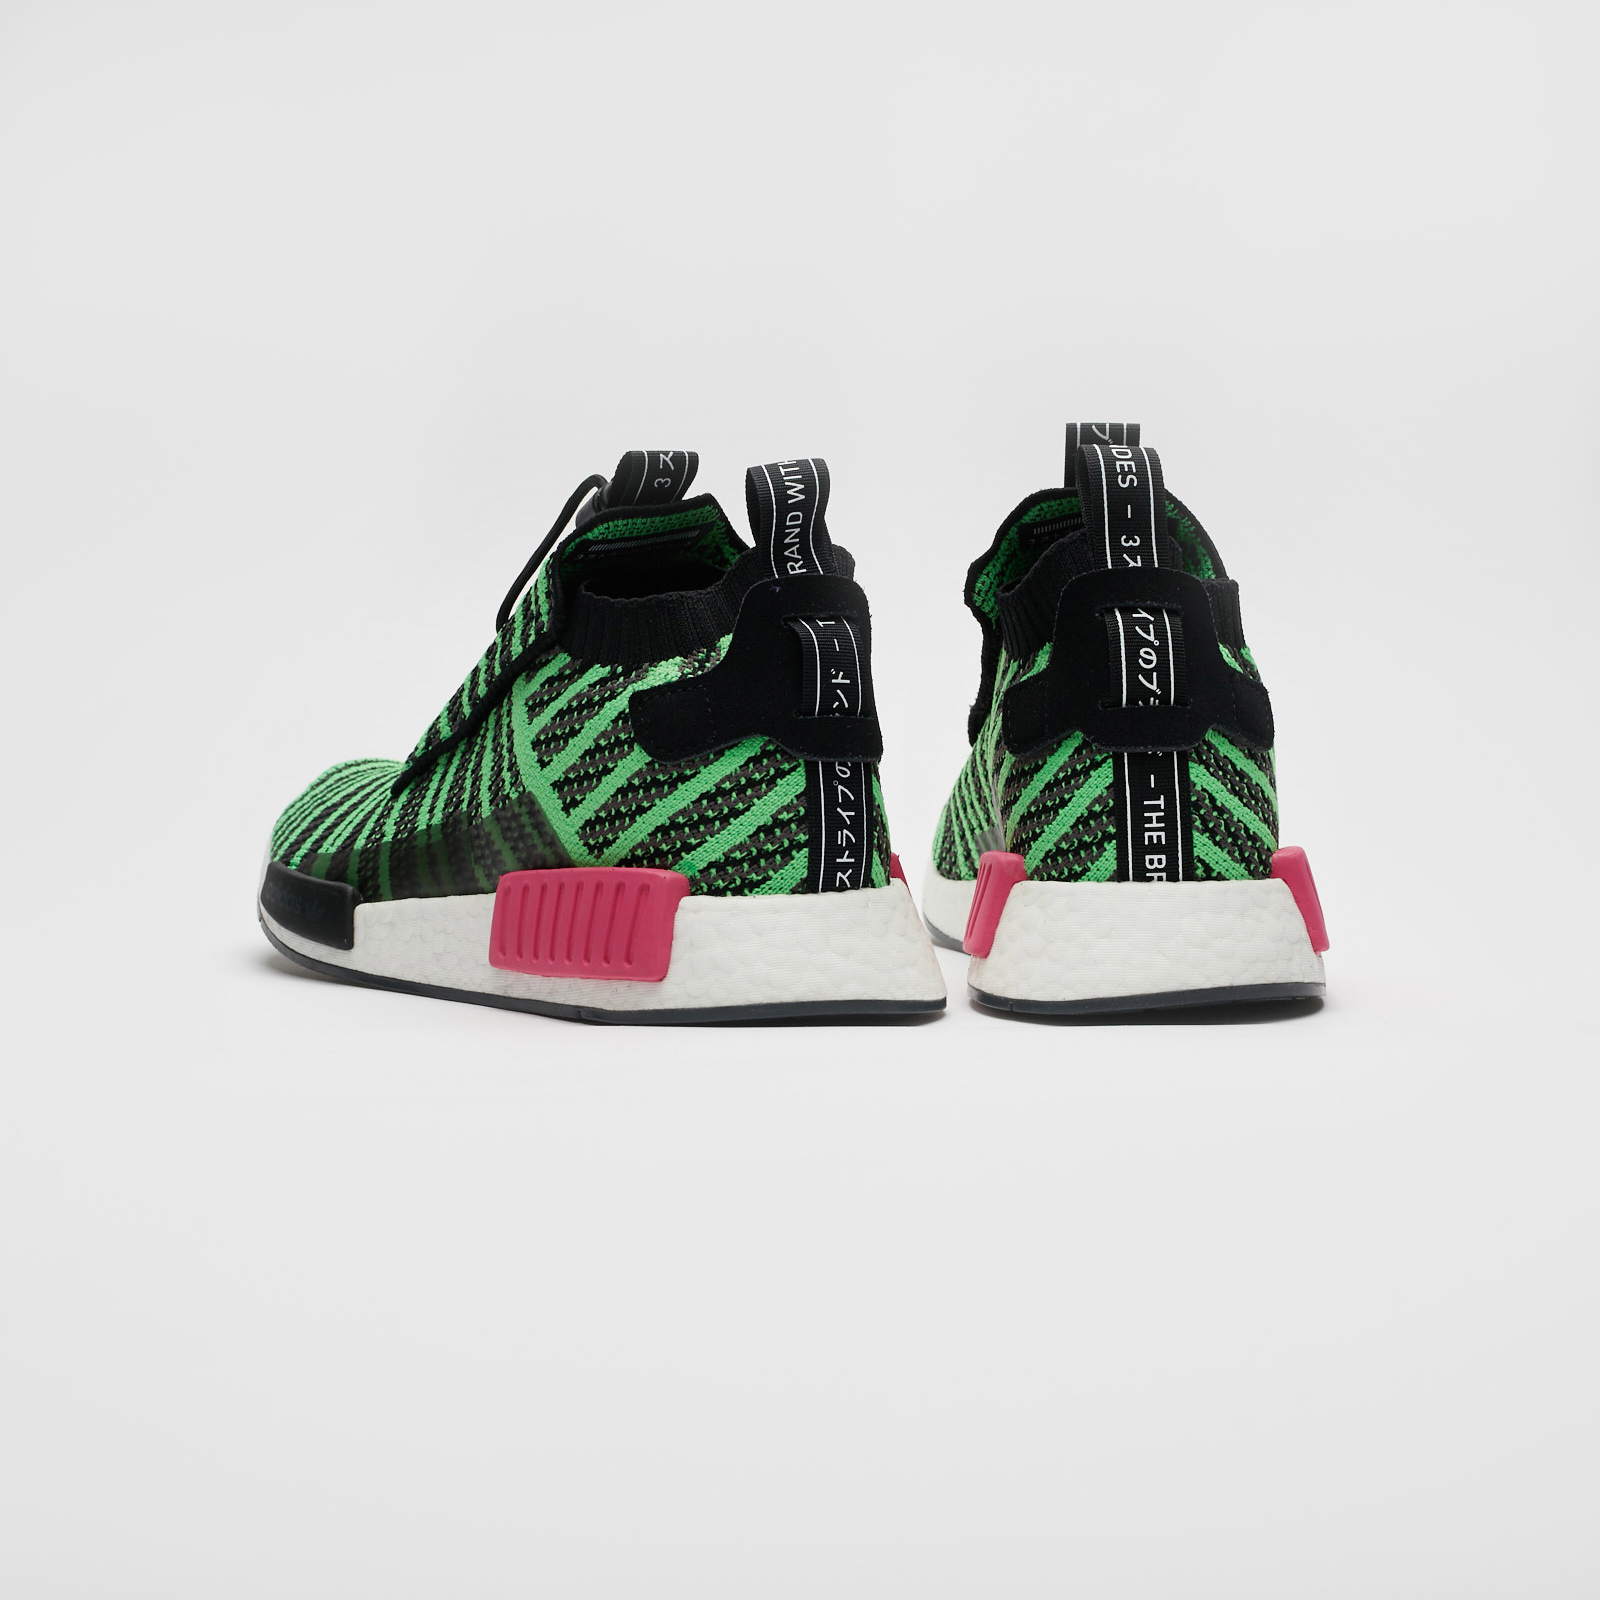 3cedfa29be604 adidas NMD TS1 PK - B37628 - Sneakersnstuff